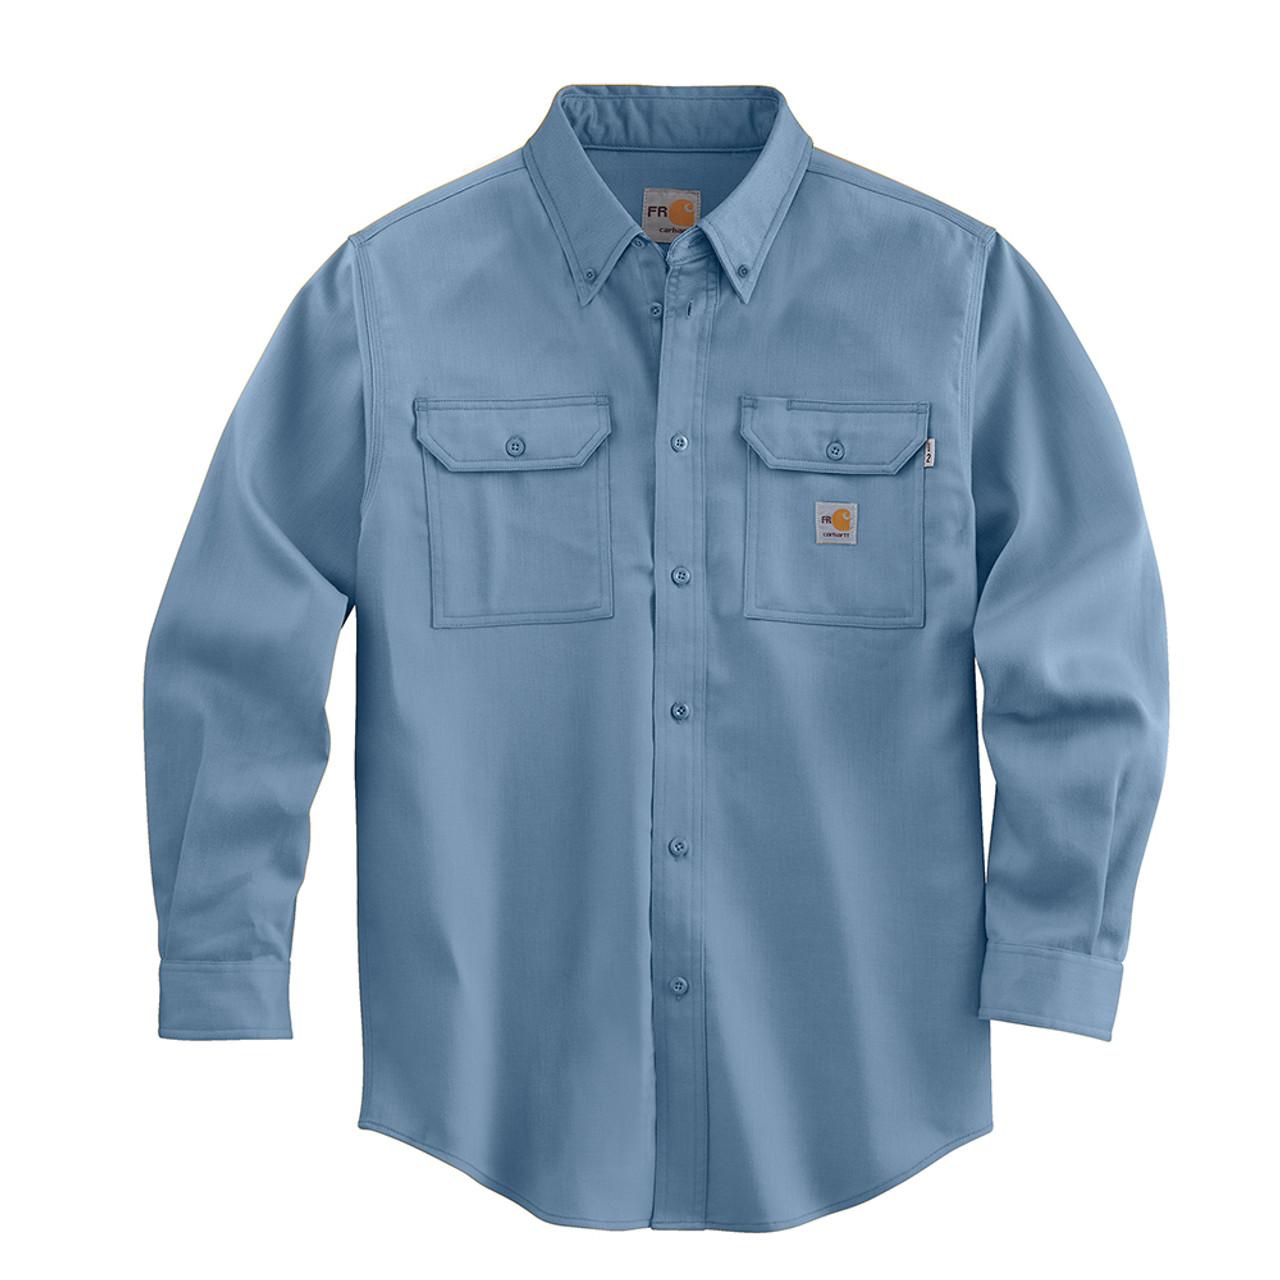 a76c56692abd FRS003 Men s Flame Resistant Lightweight Twill Shirt